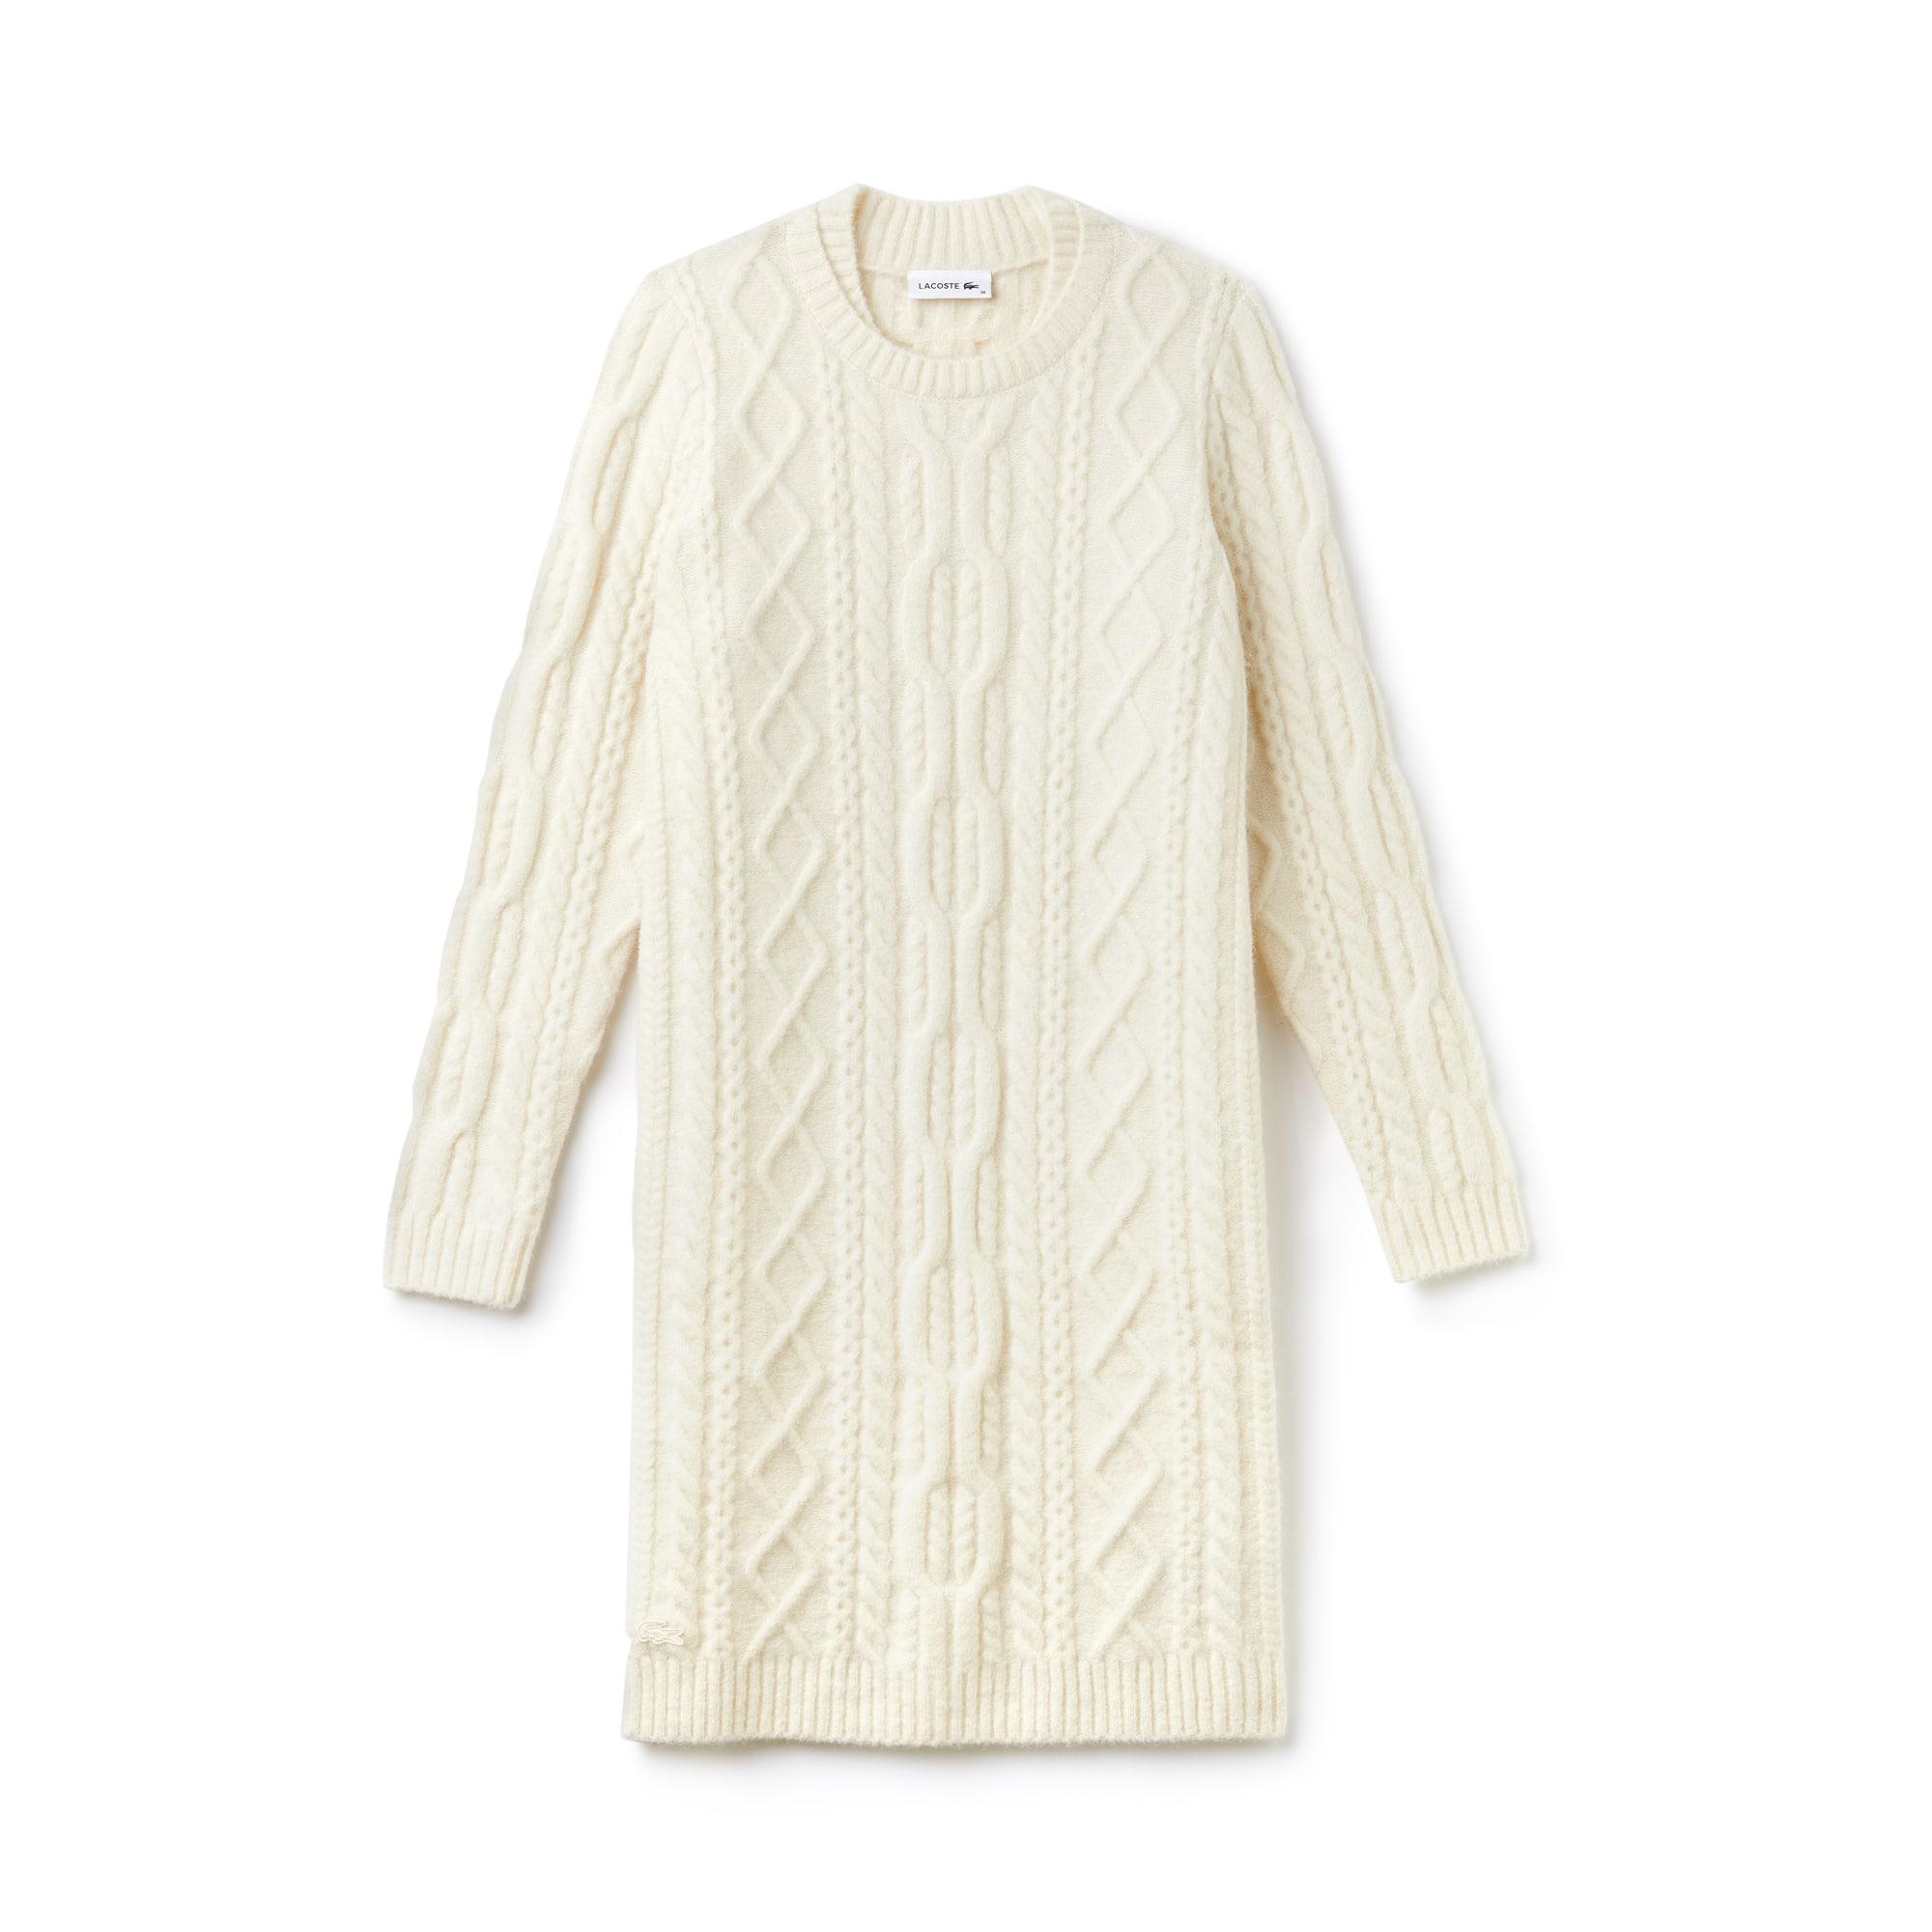 257b315c79c Robe pull en alpaga et laine torsadés unis